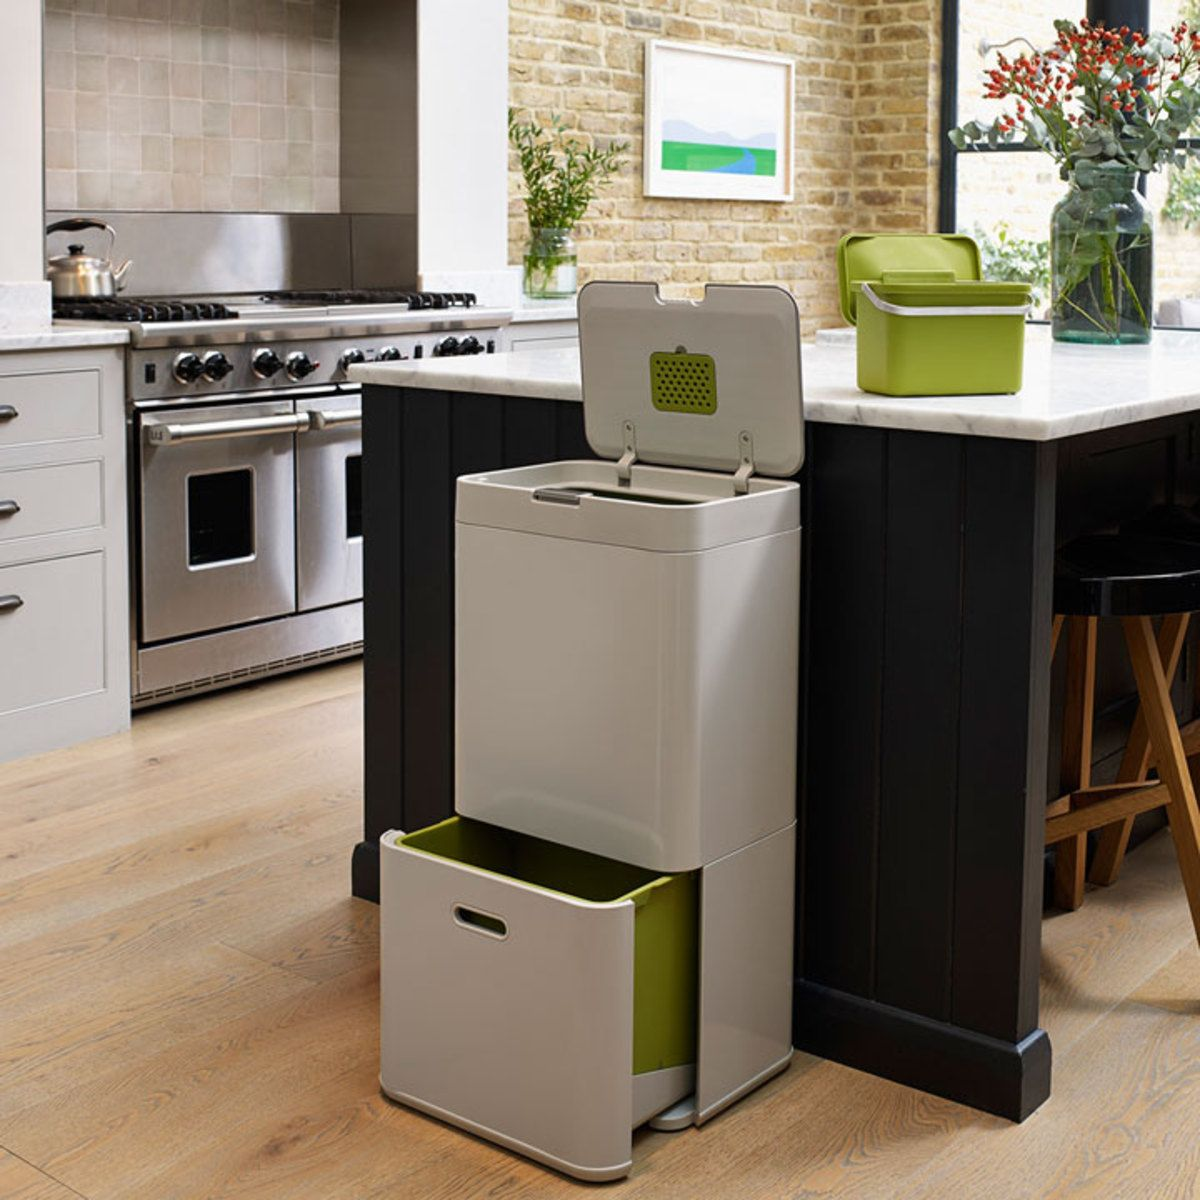 Poubelle Totem 60 Litres Pierre 30001 Achat Trash Can Kitchen Bin Recycling